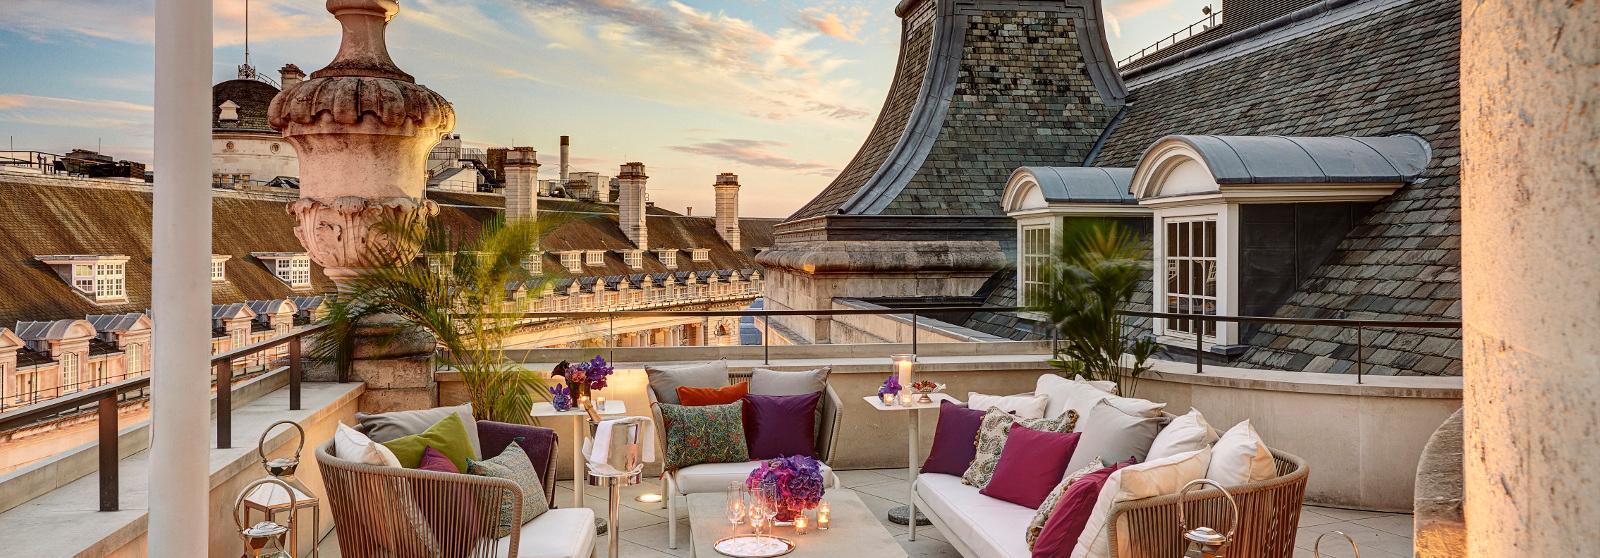 皇家凯馥酒店(Hotel Cafe Royal)【 伦敦,英国】 酒店  www.lhw.cn